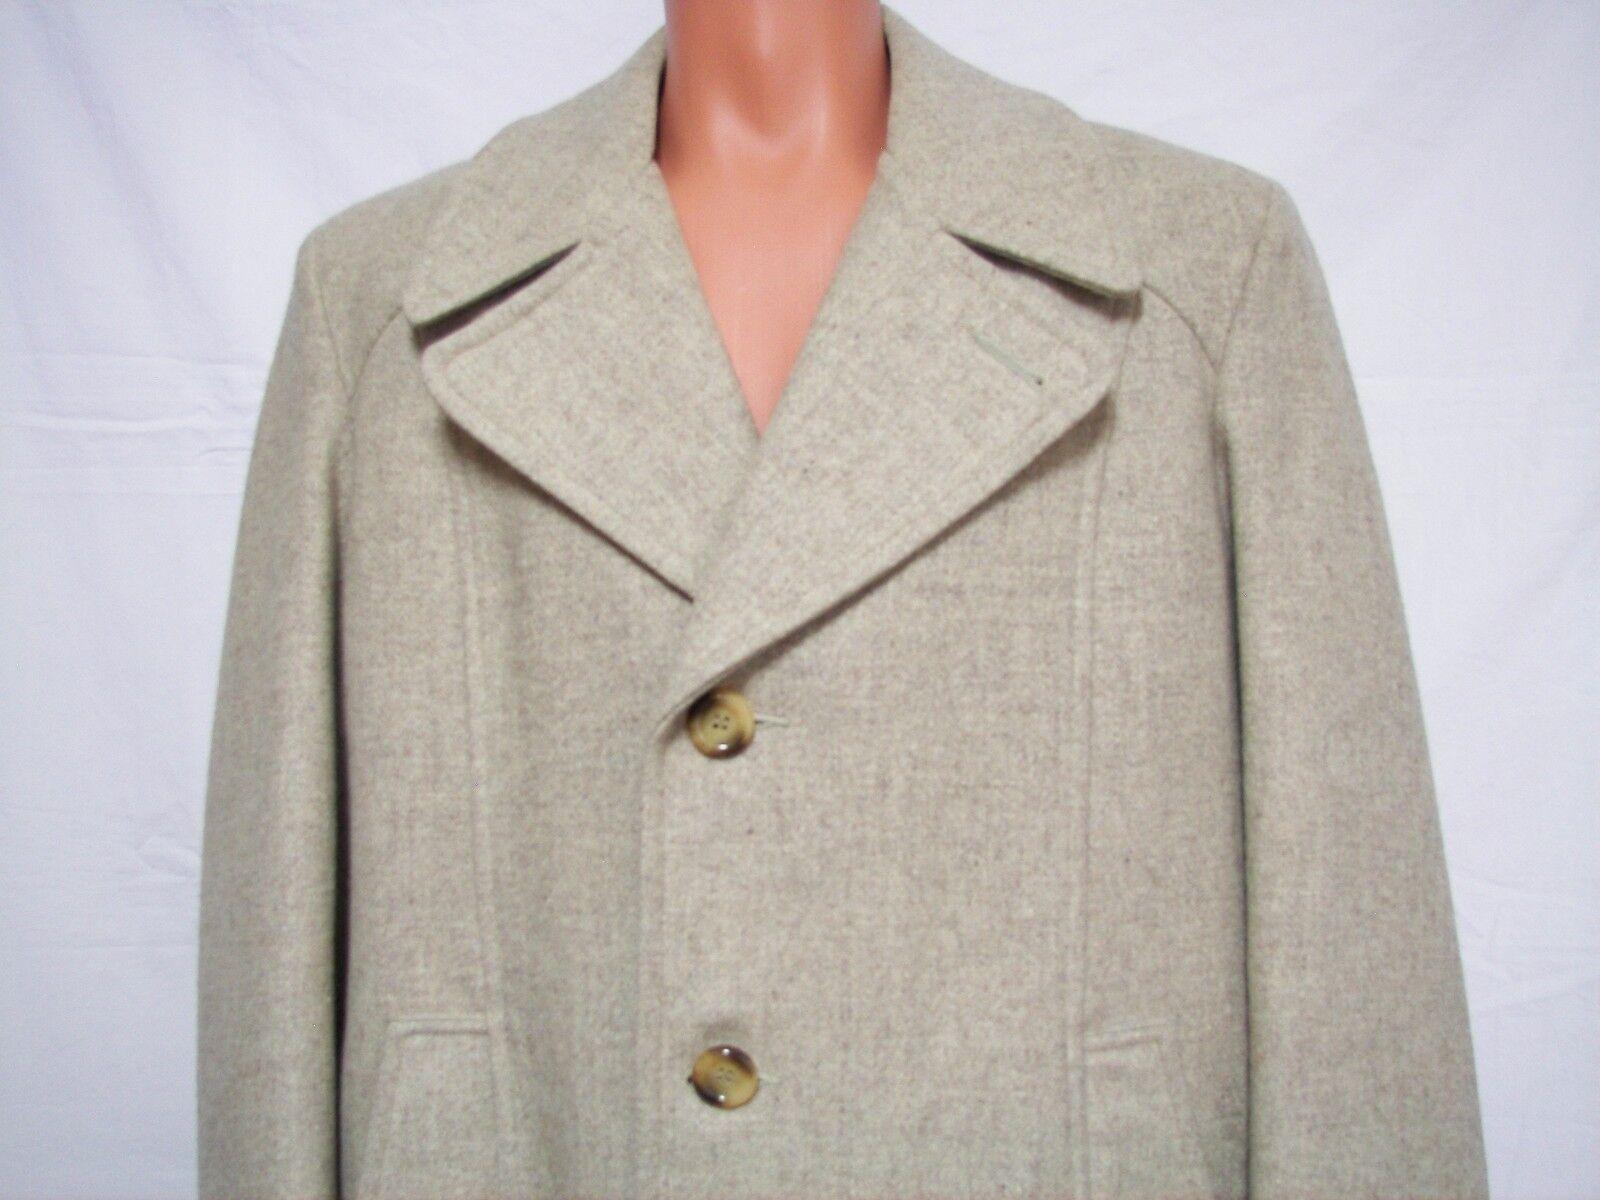 Mens Wool Dress Coat Size 42R Vintage USA by Thgoldughbred  Beige Tweed